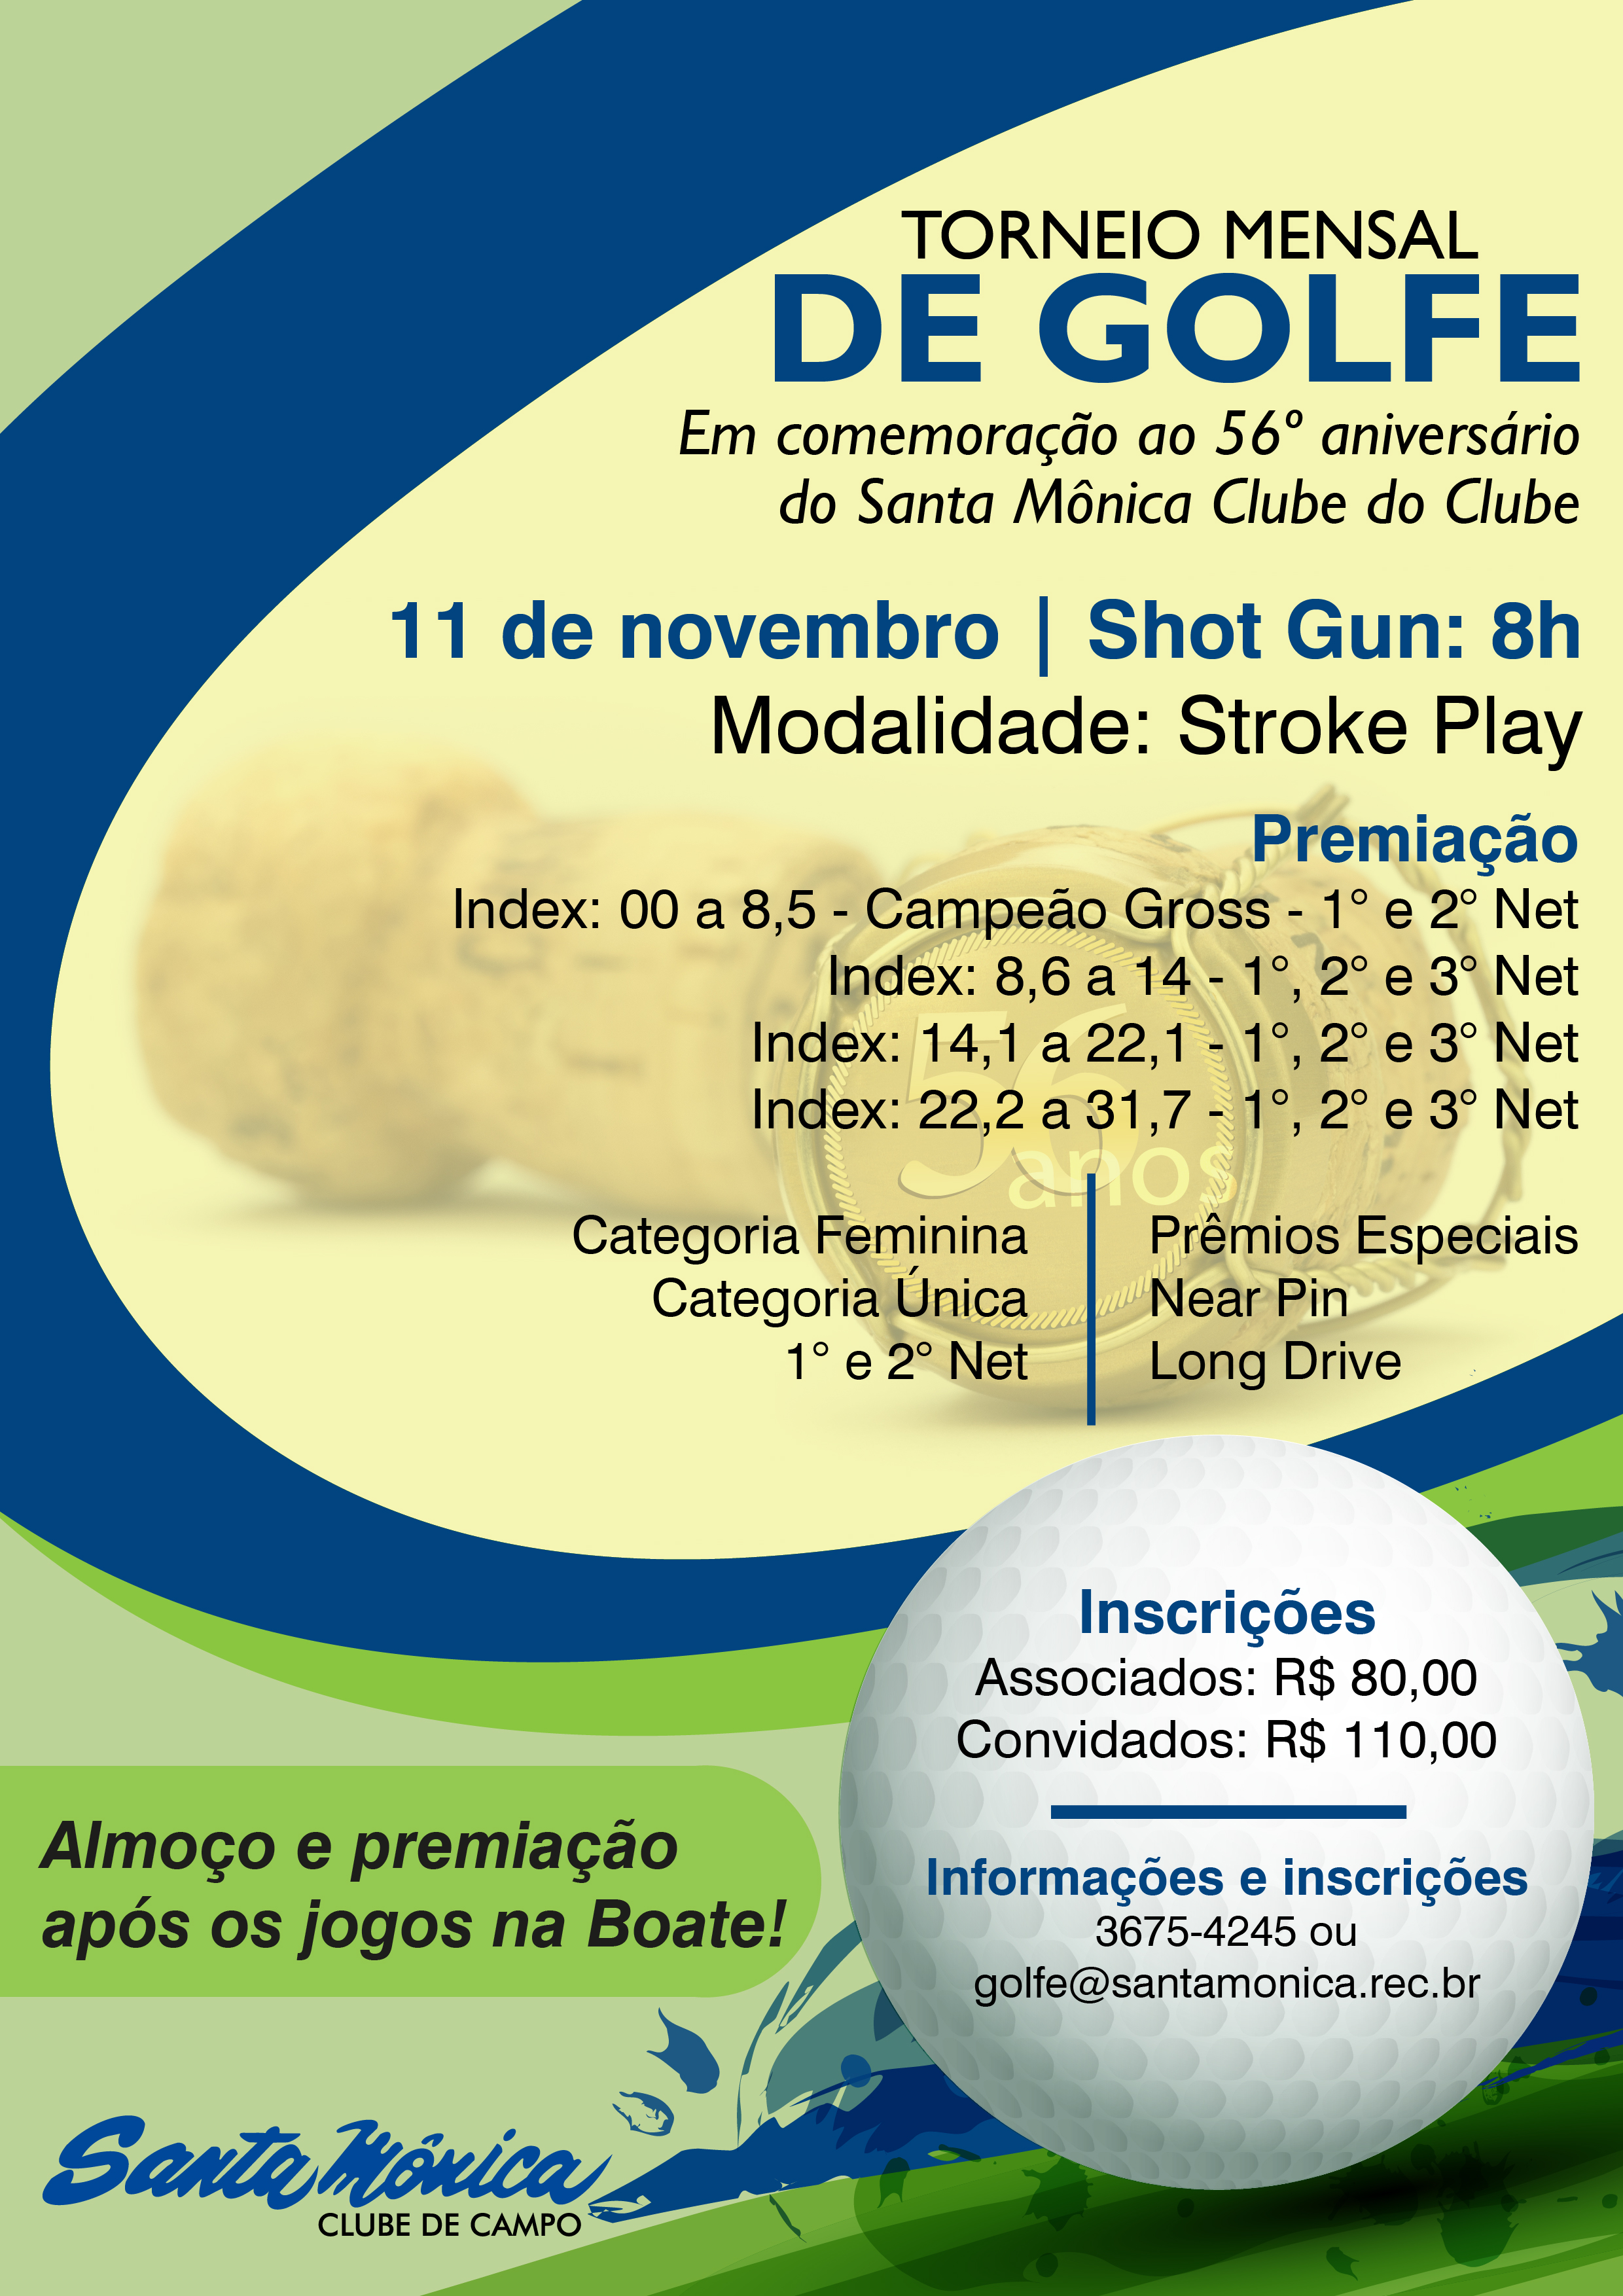 CartazA4_Torneio Mensal_Novembro-01